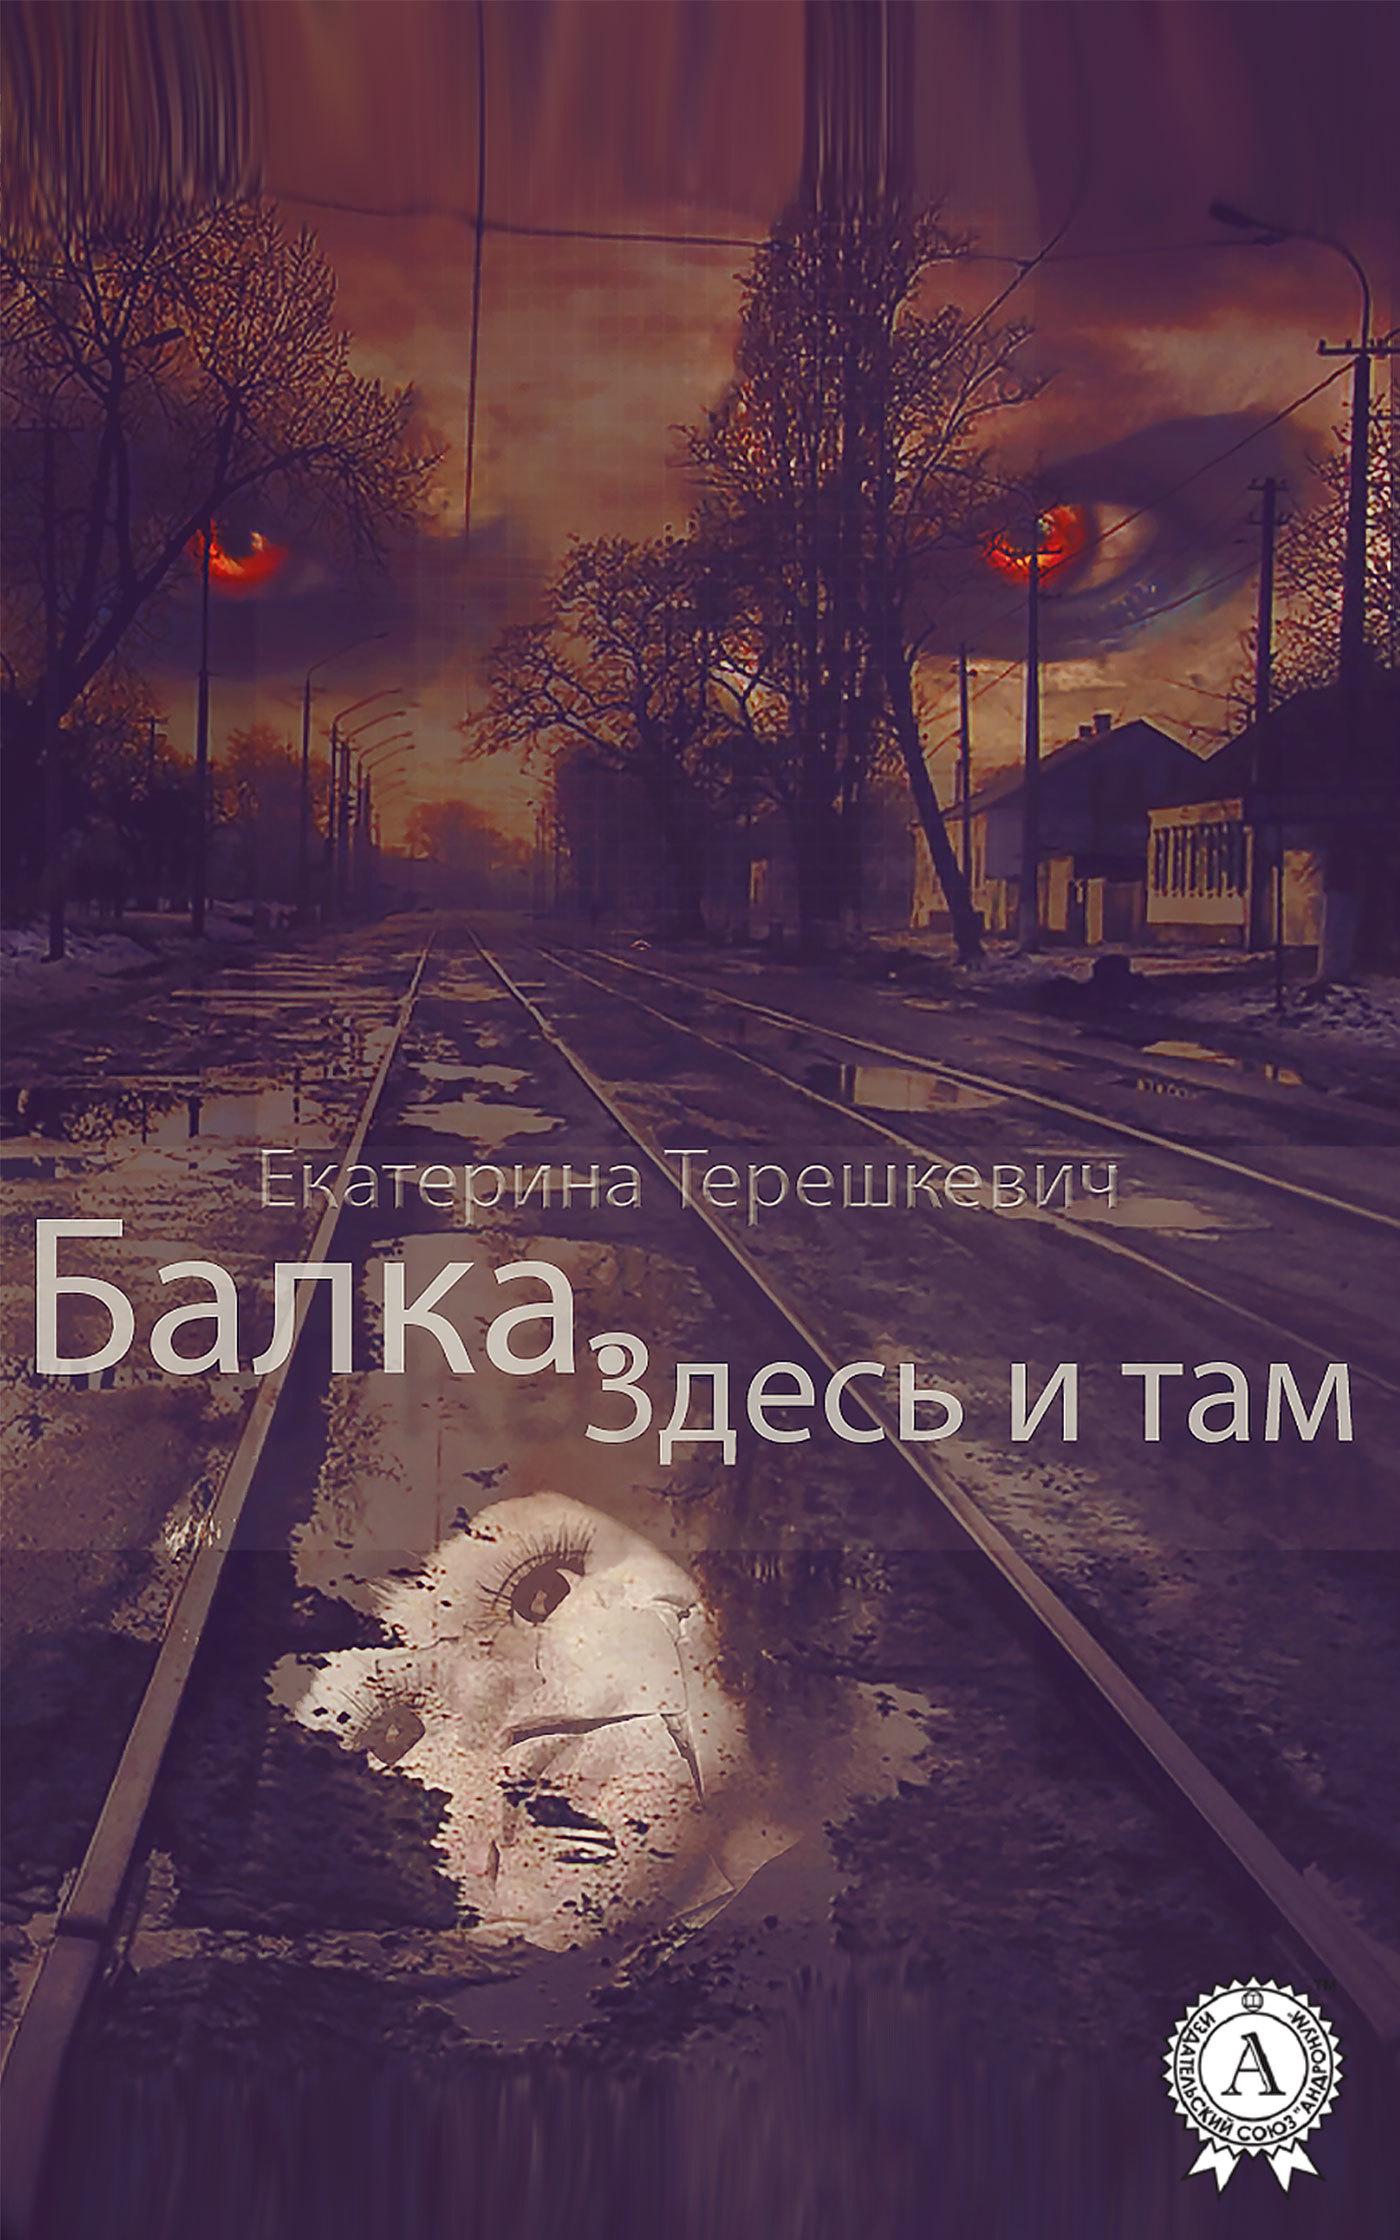 Екатерина Терешкевич Балка. Здесь и там